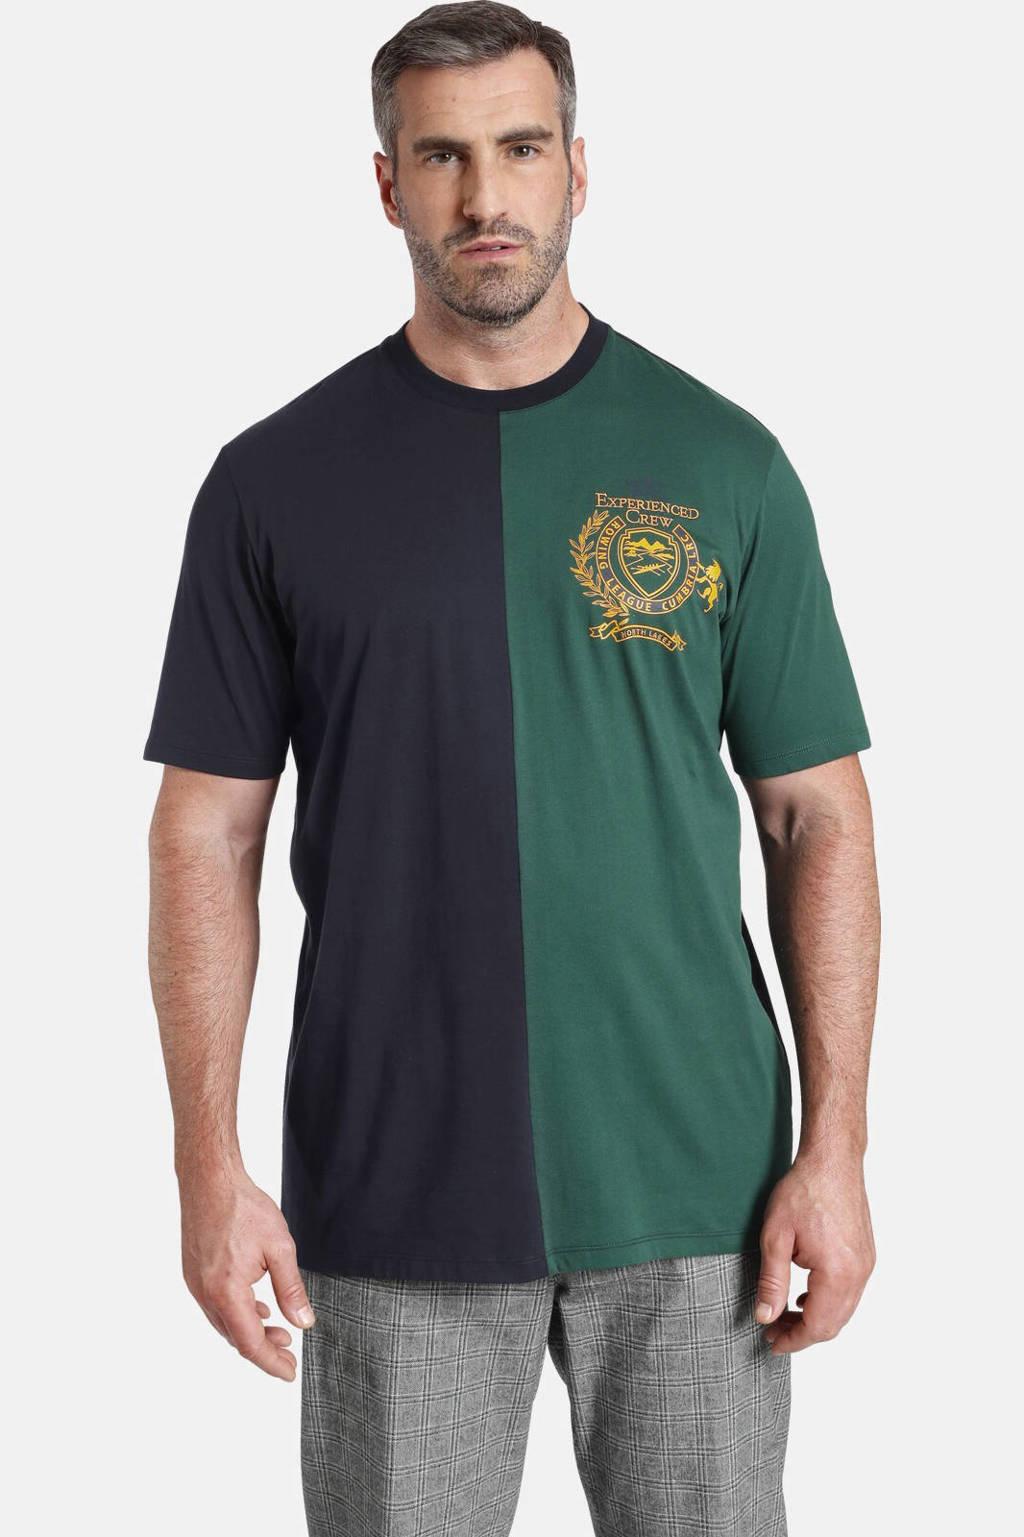 Charles Colby T-shirt EARL VERNON Plus Size met borduursels donkerblauw/groen, Donkerblauw/groen